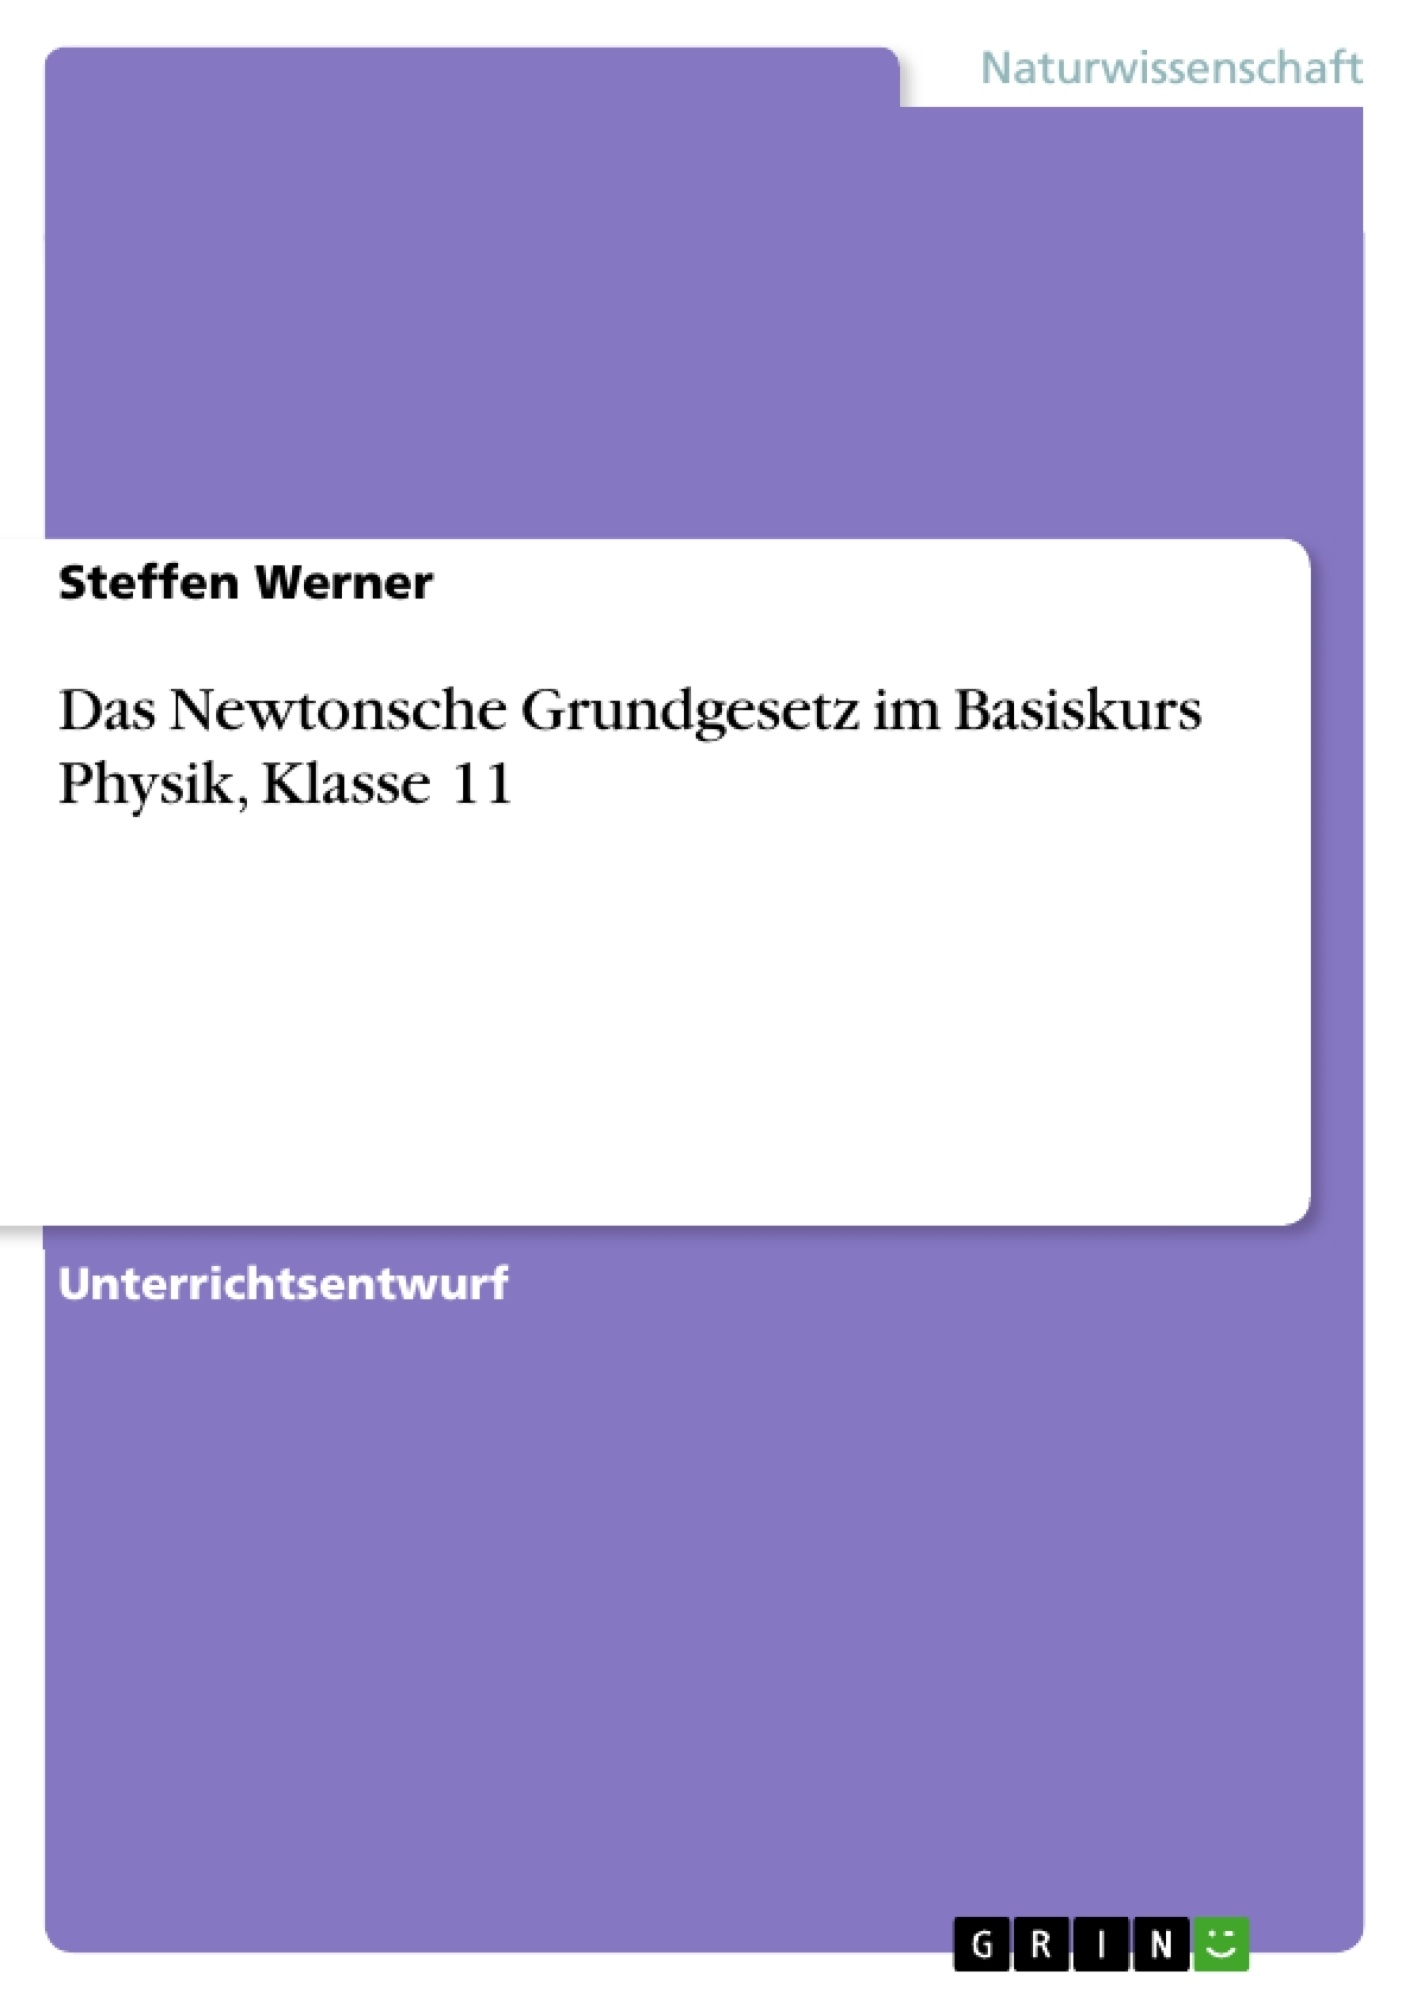 Titel: Das Newtonsche Grundgesetz im Basiskurs Physik, Klasse 11